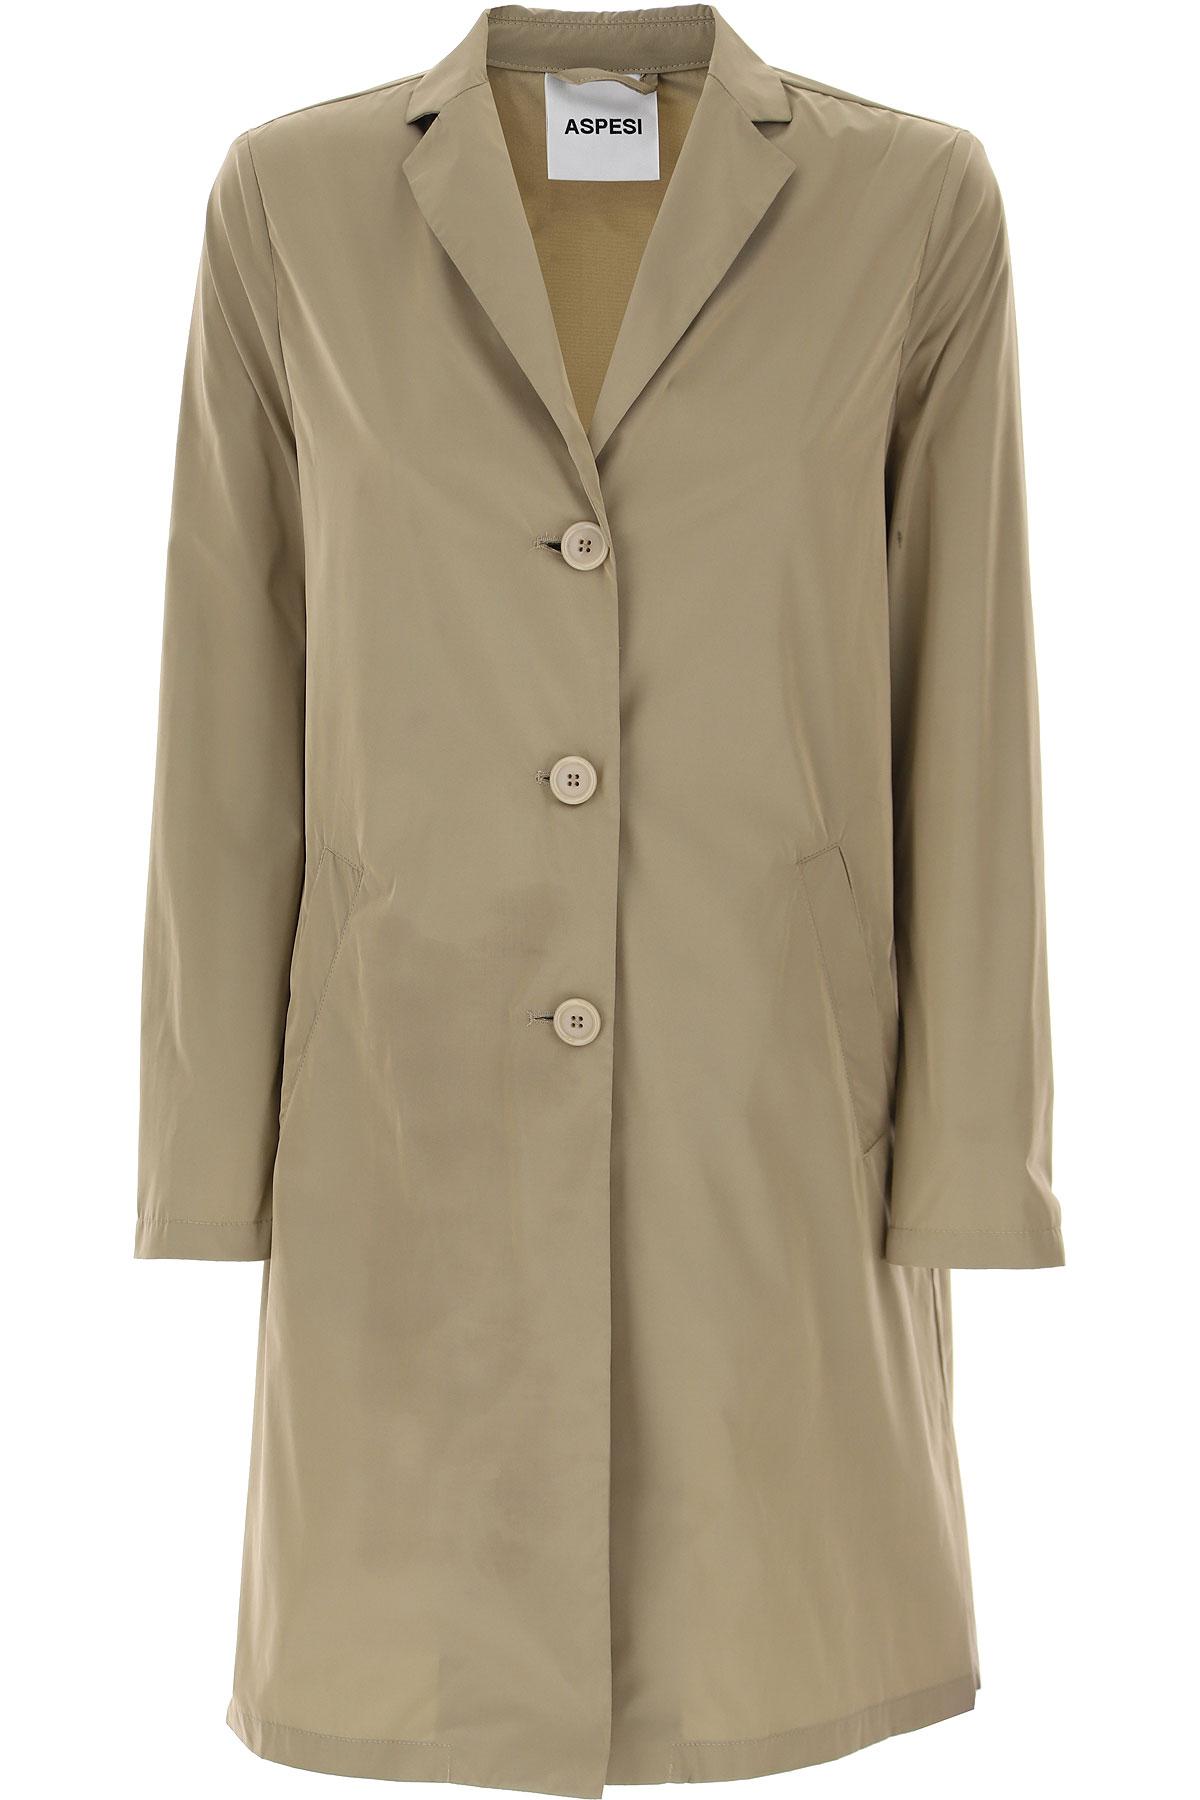 Aspesi Women's Coat On Sale, polyester, 2019, 4 6 8